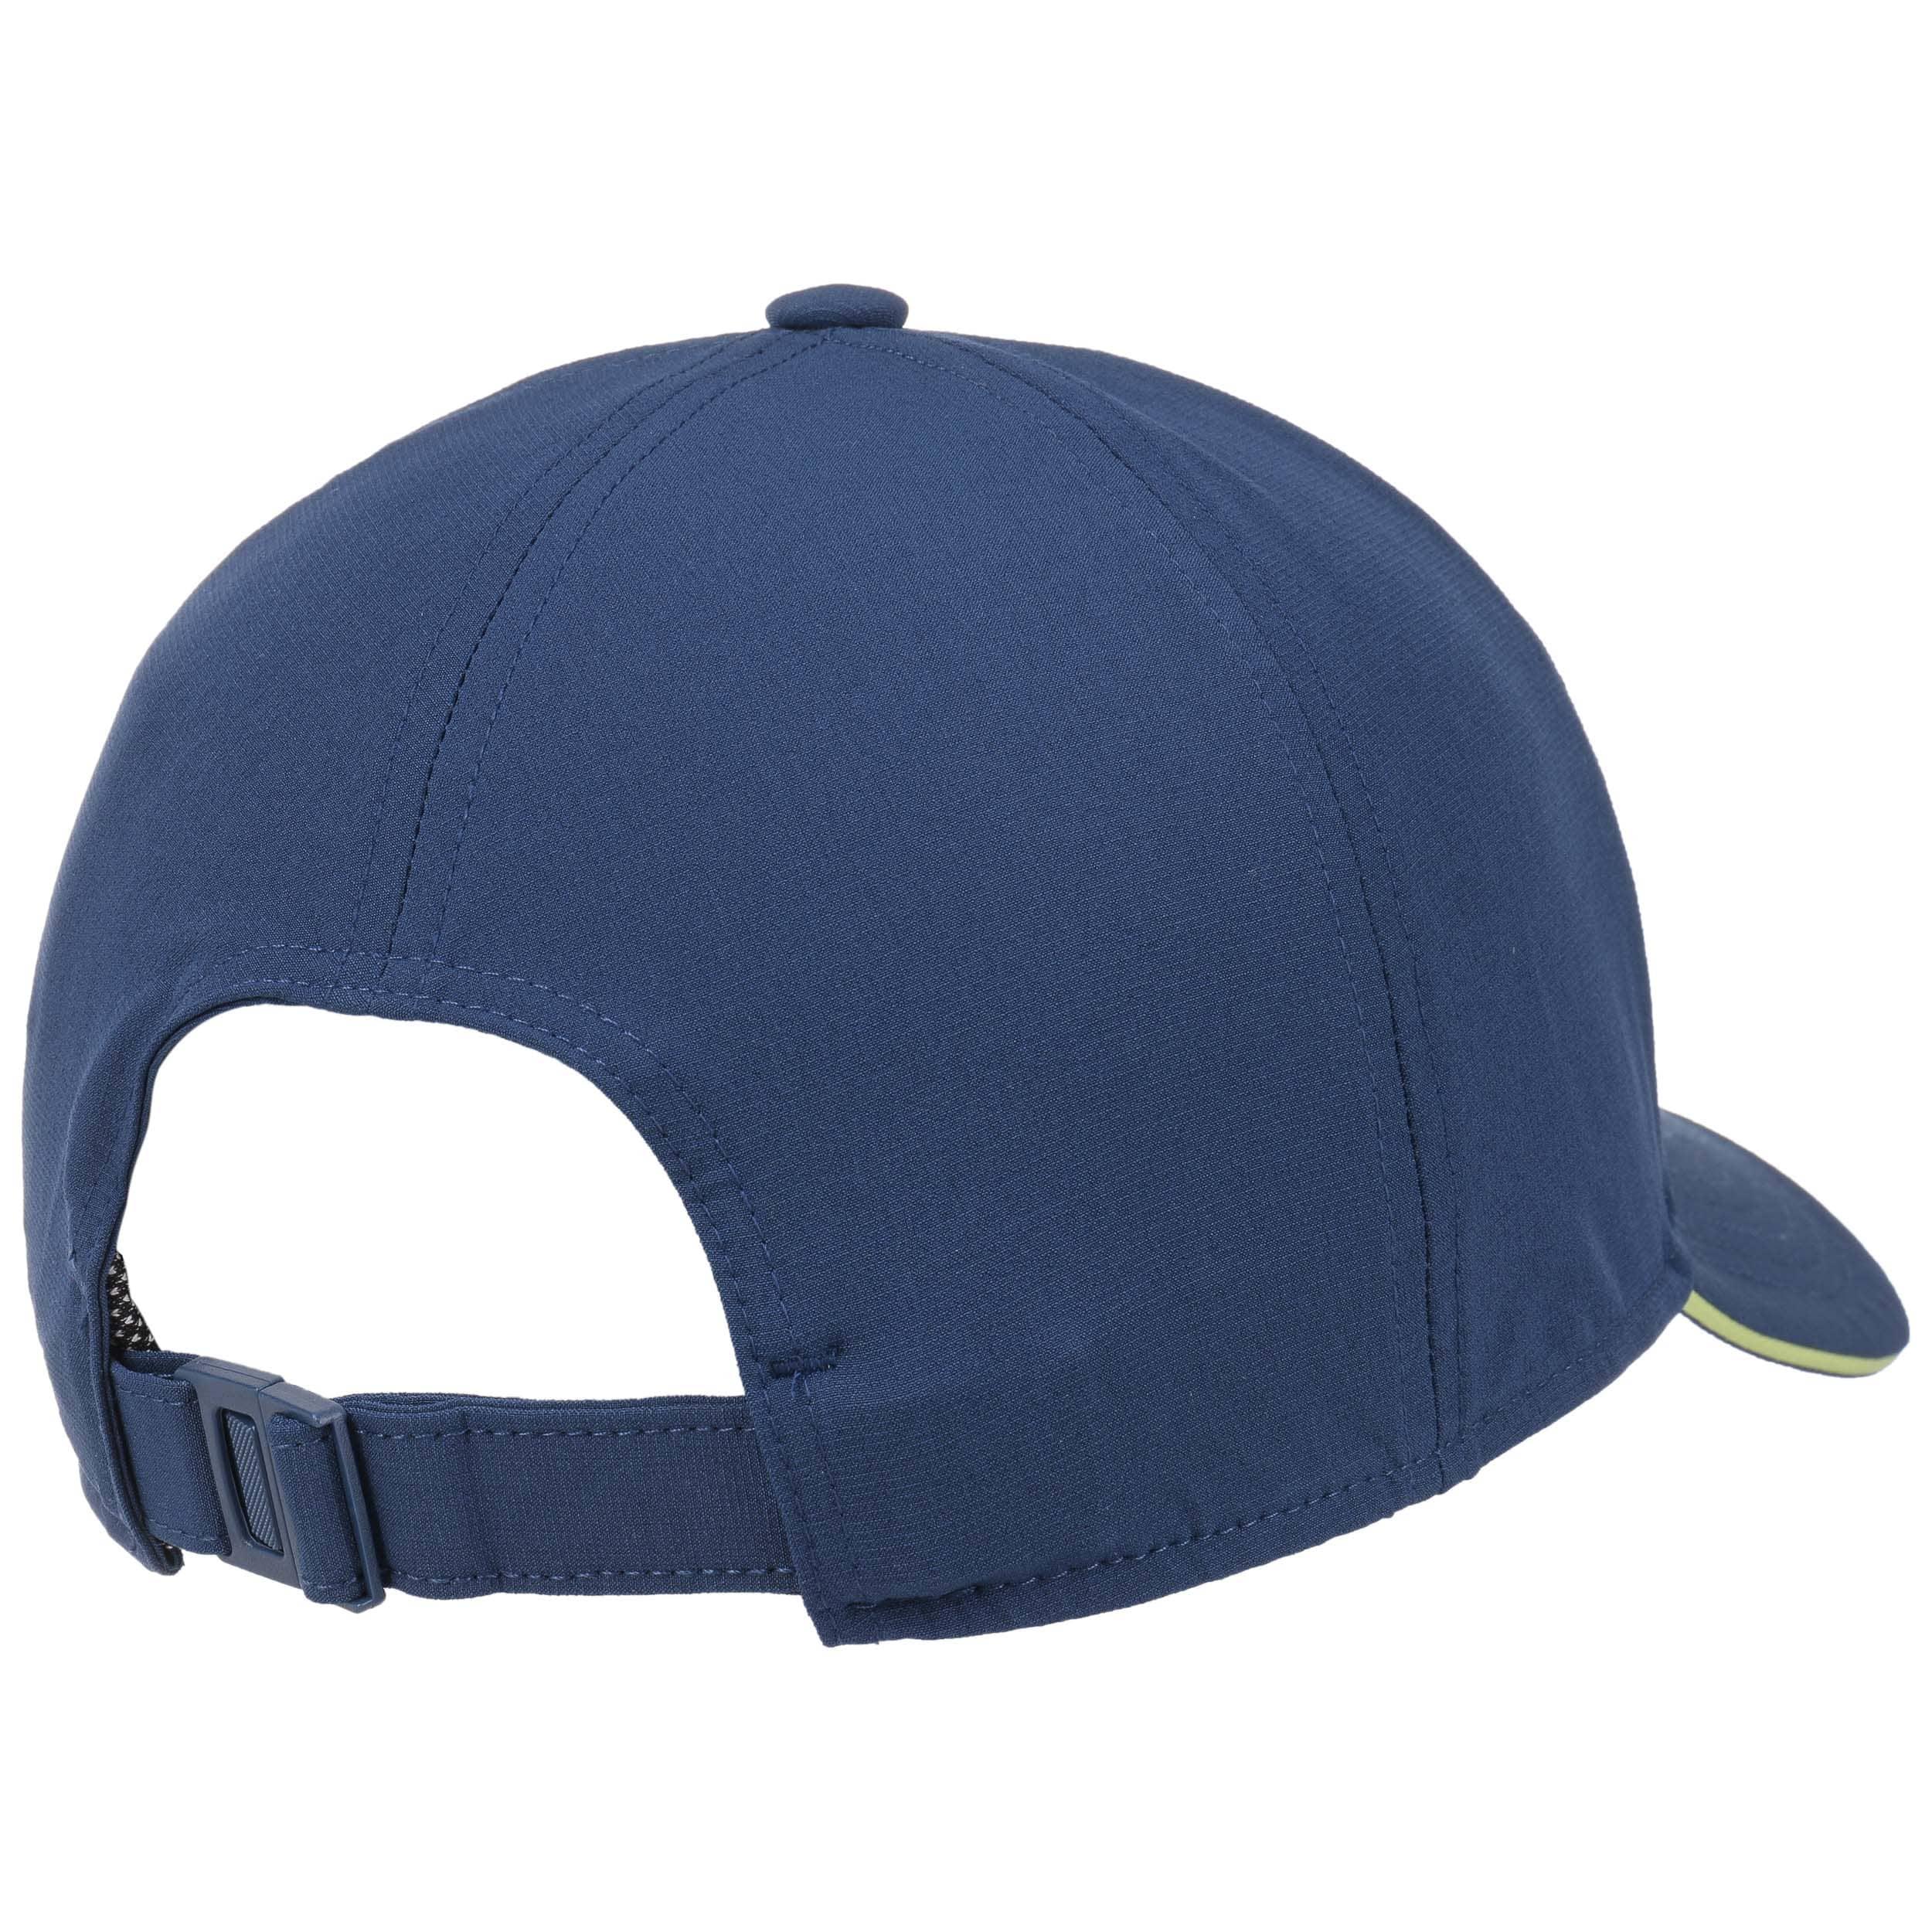 4b2884ab994 ... navy 3 · C40 5P Climalite Cap by adidas - blue-white 3 ...